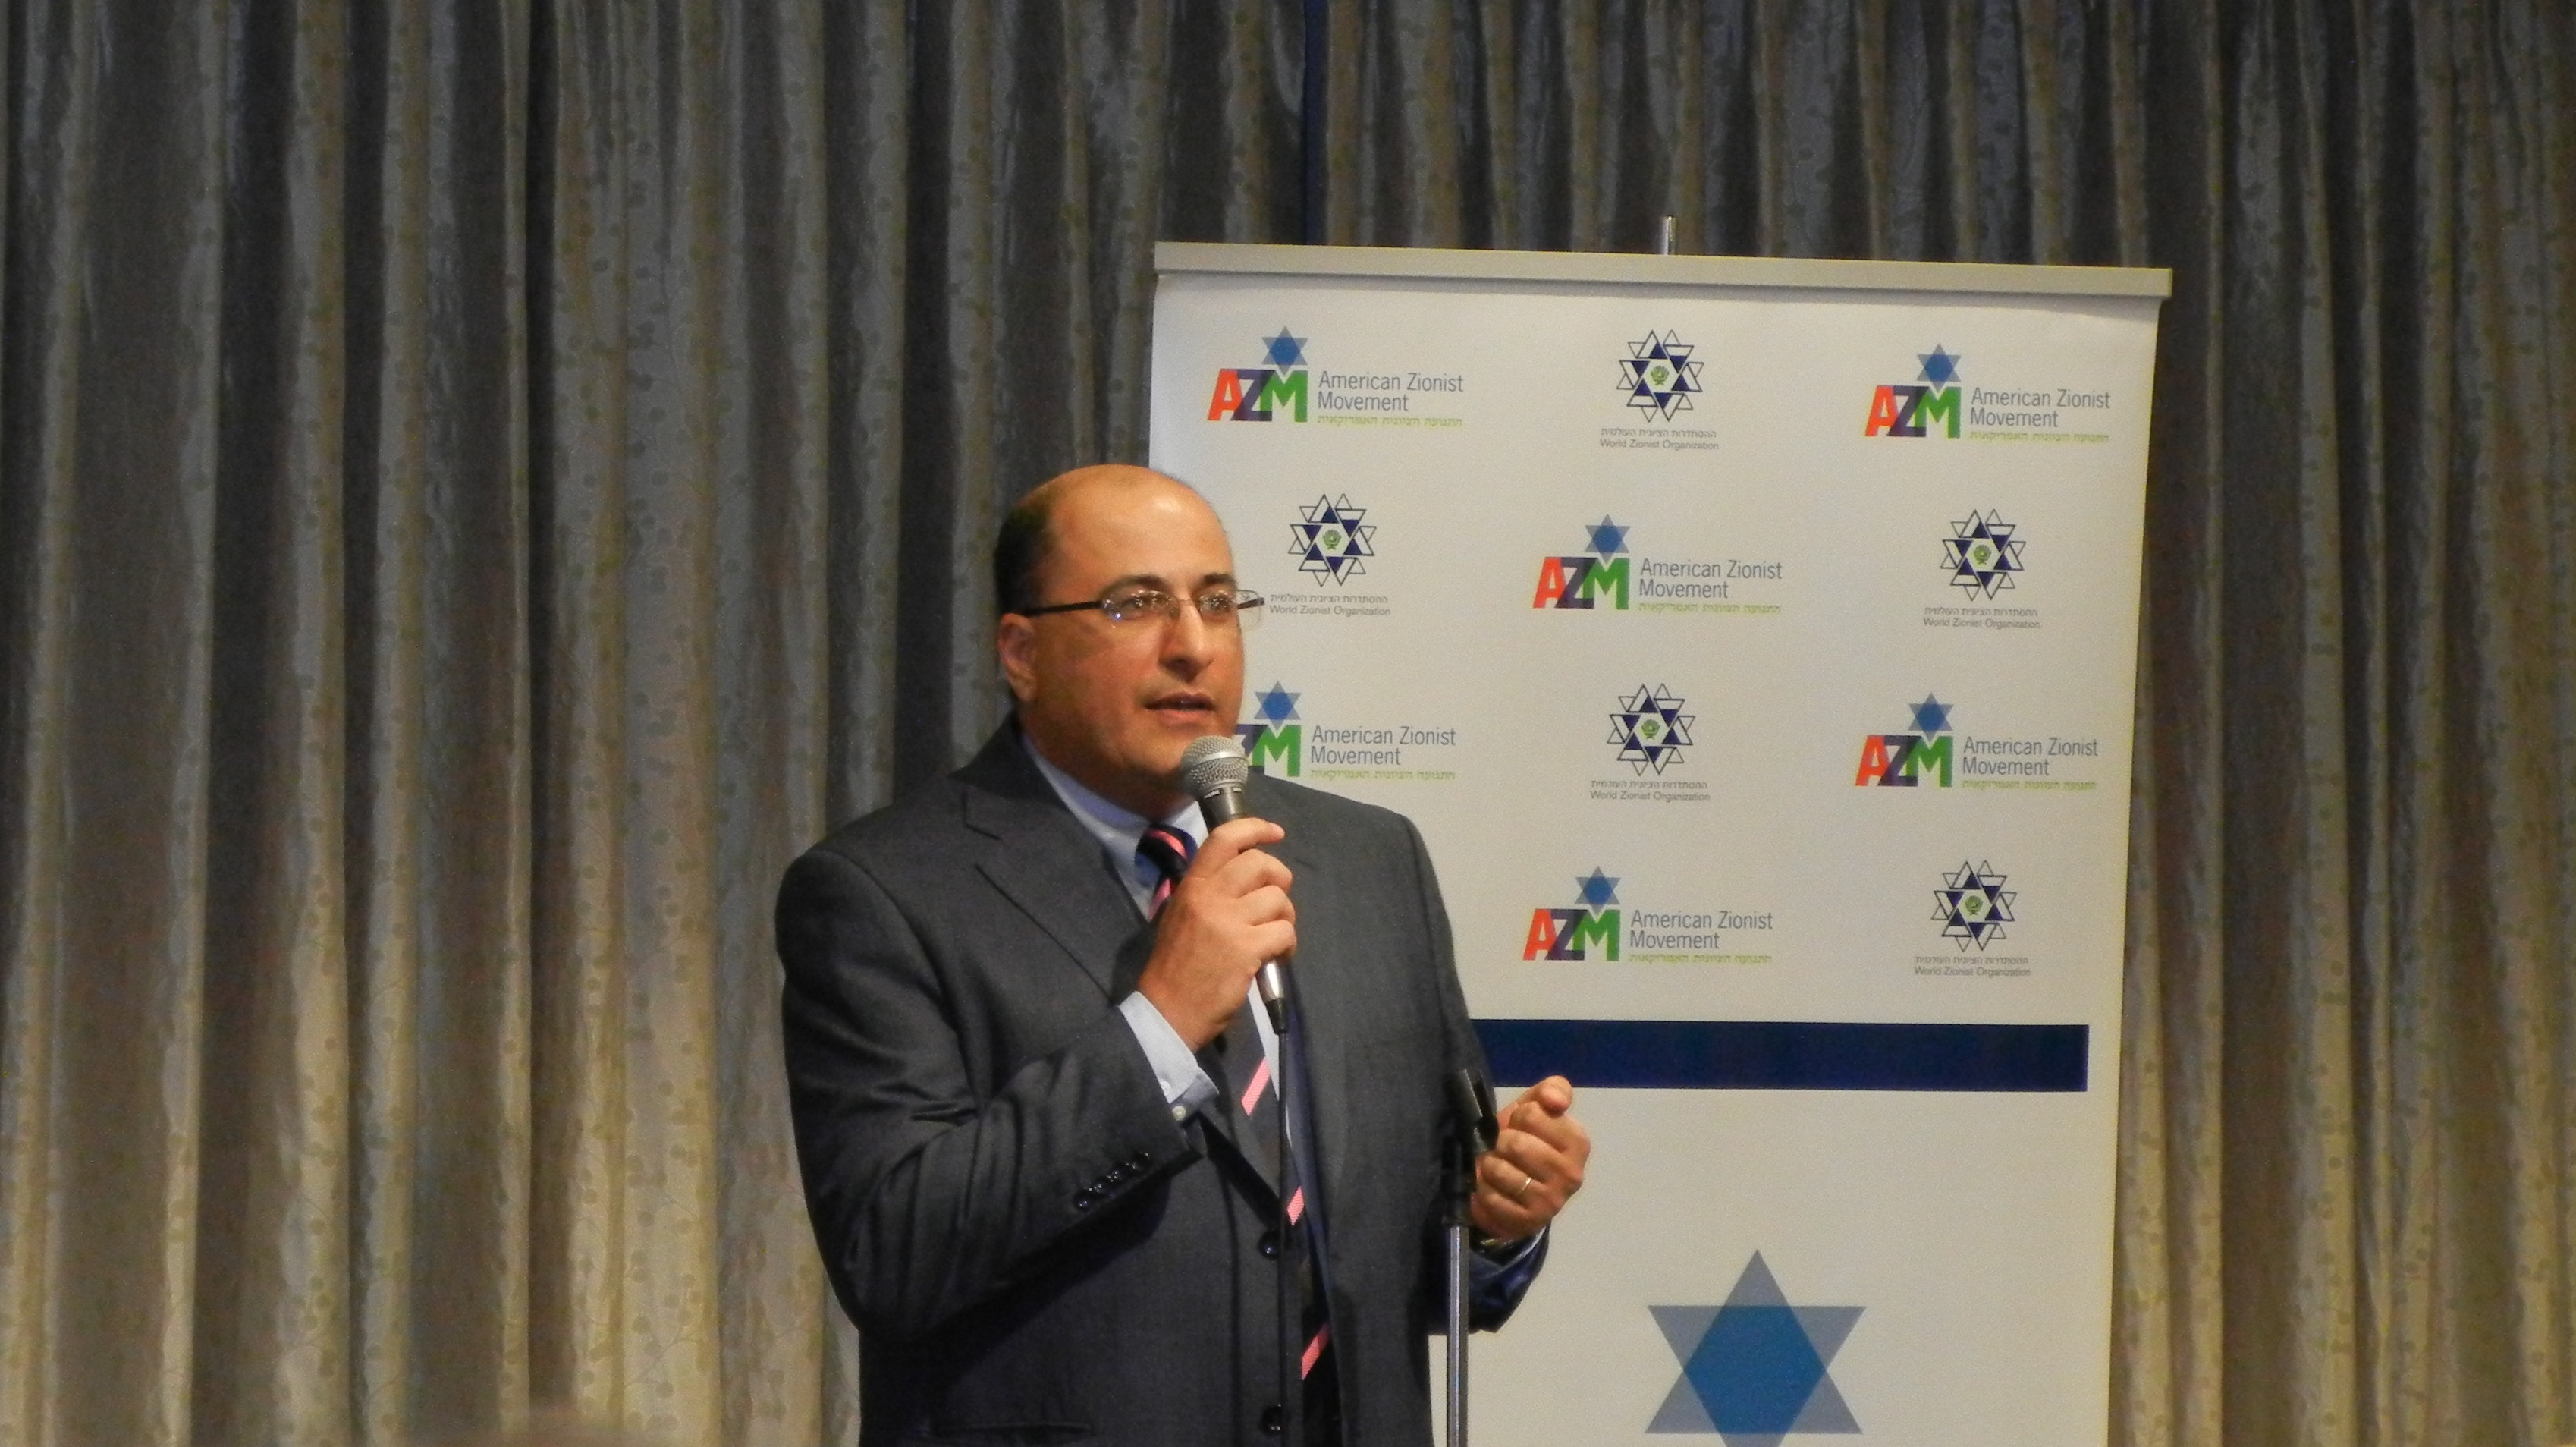 Ambassador Ido Aharoni, the Israeli Consul General to New York, addresses the crowd.